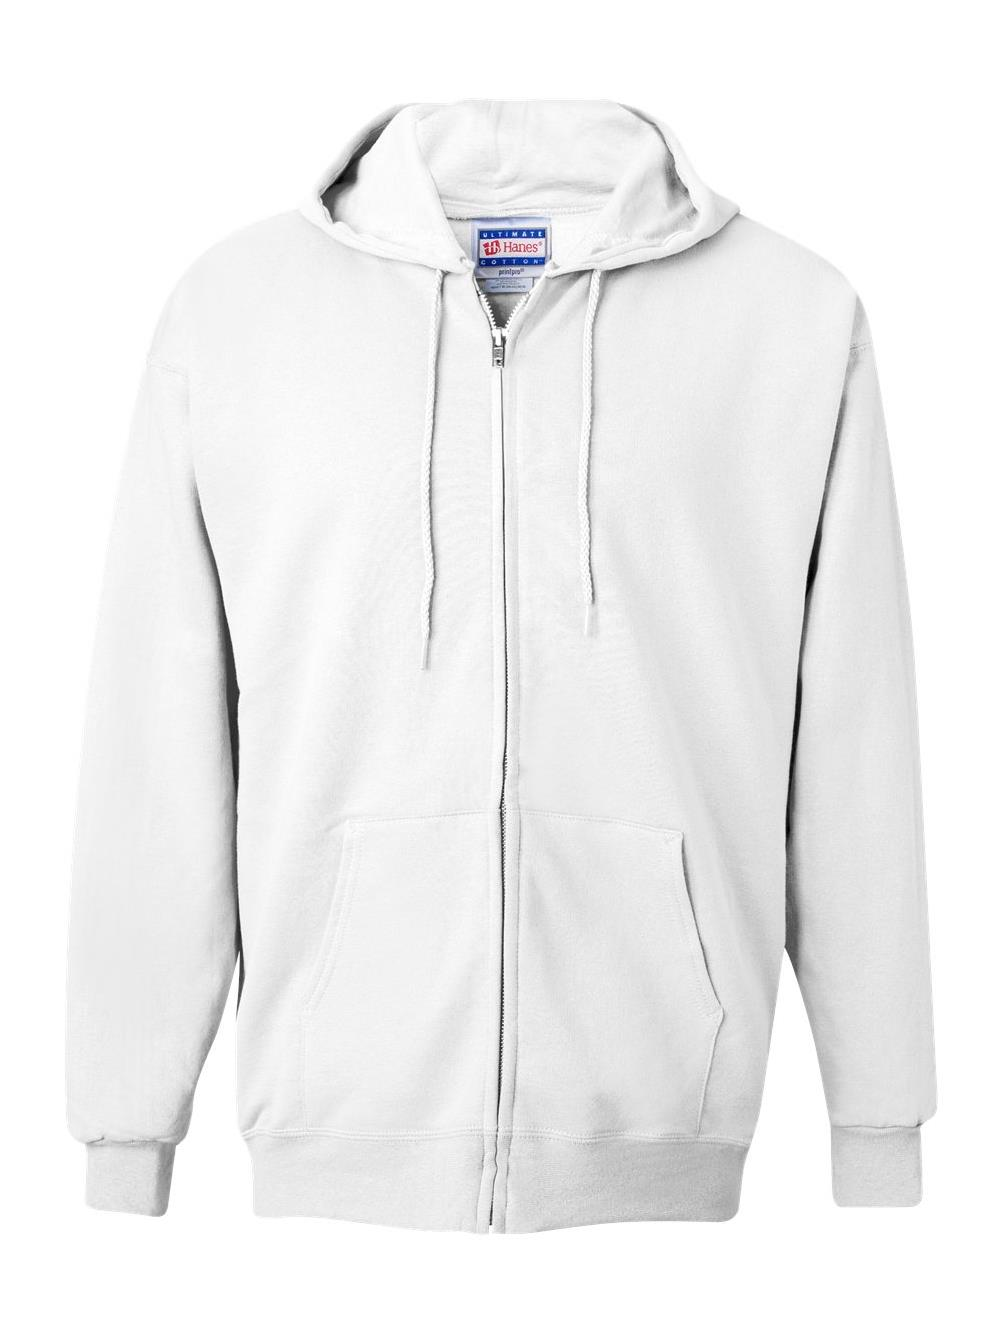 mens S-3XL Hanes PrintProXP Ultimate Cotton Full-Zip Hooded Sweatshirt F280